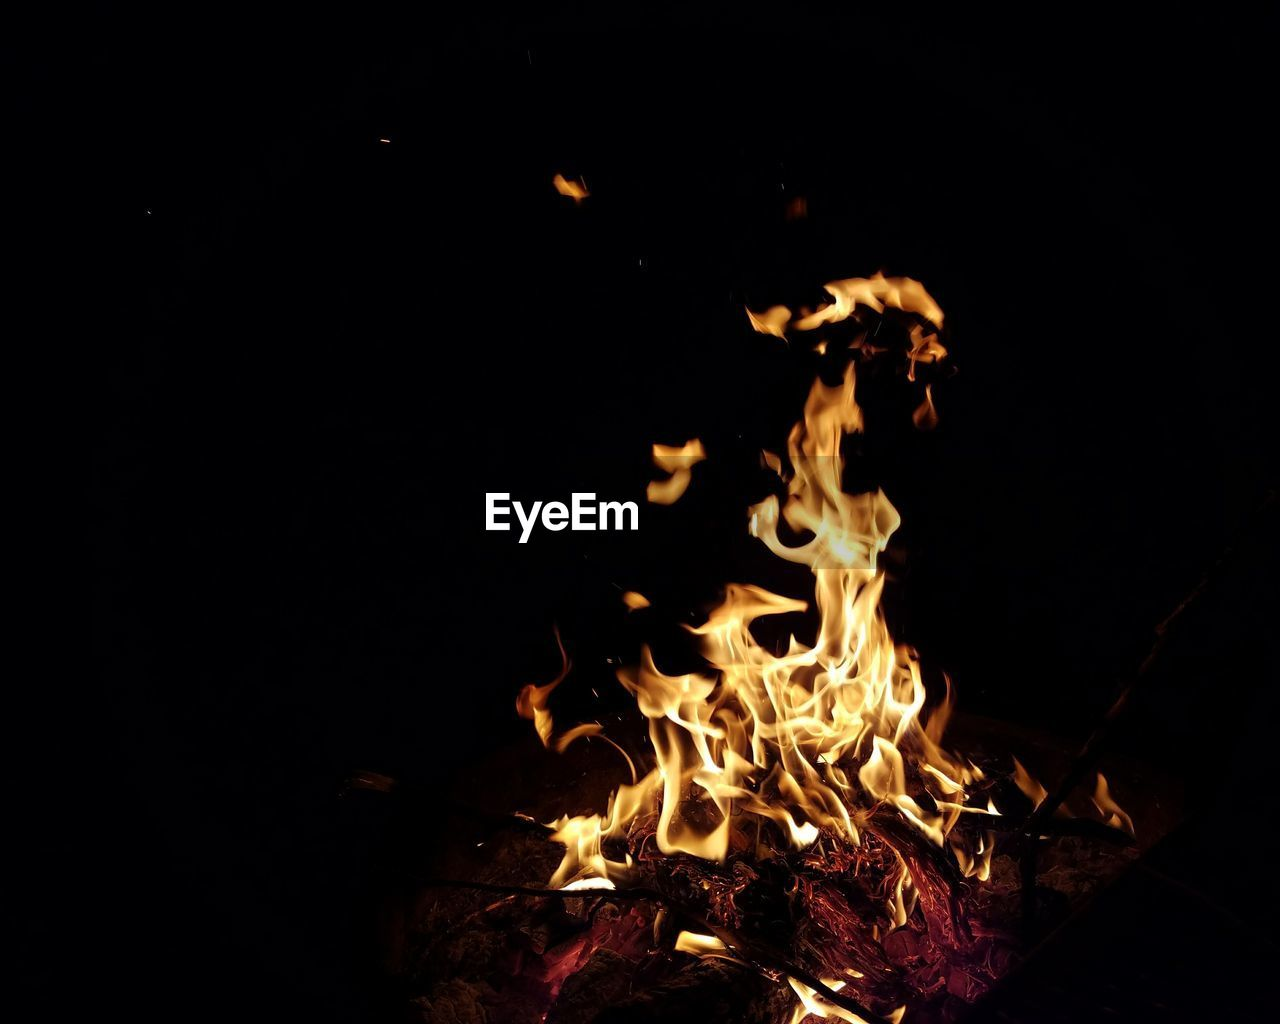 night, burning, no people, heat - temperature, flame, outdoors, close-up, bonfire, nature